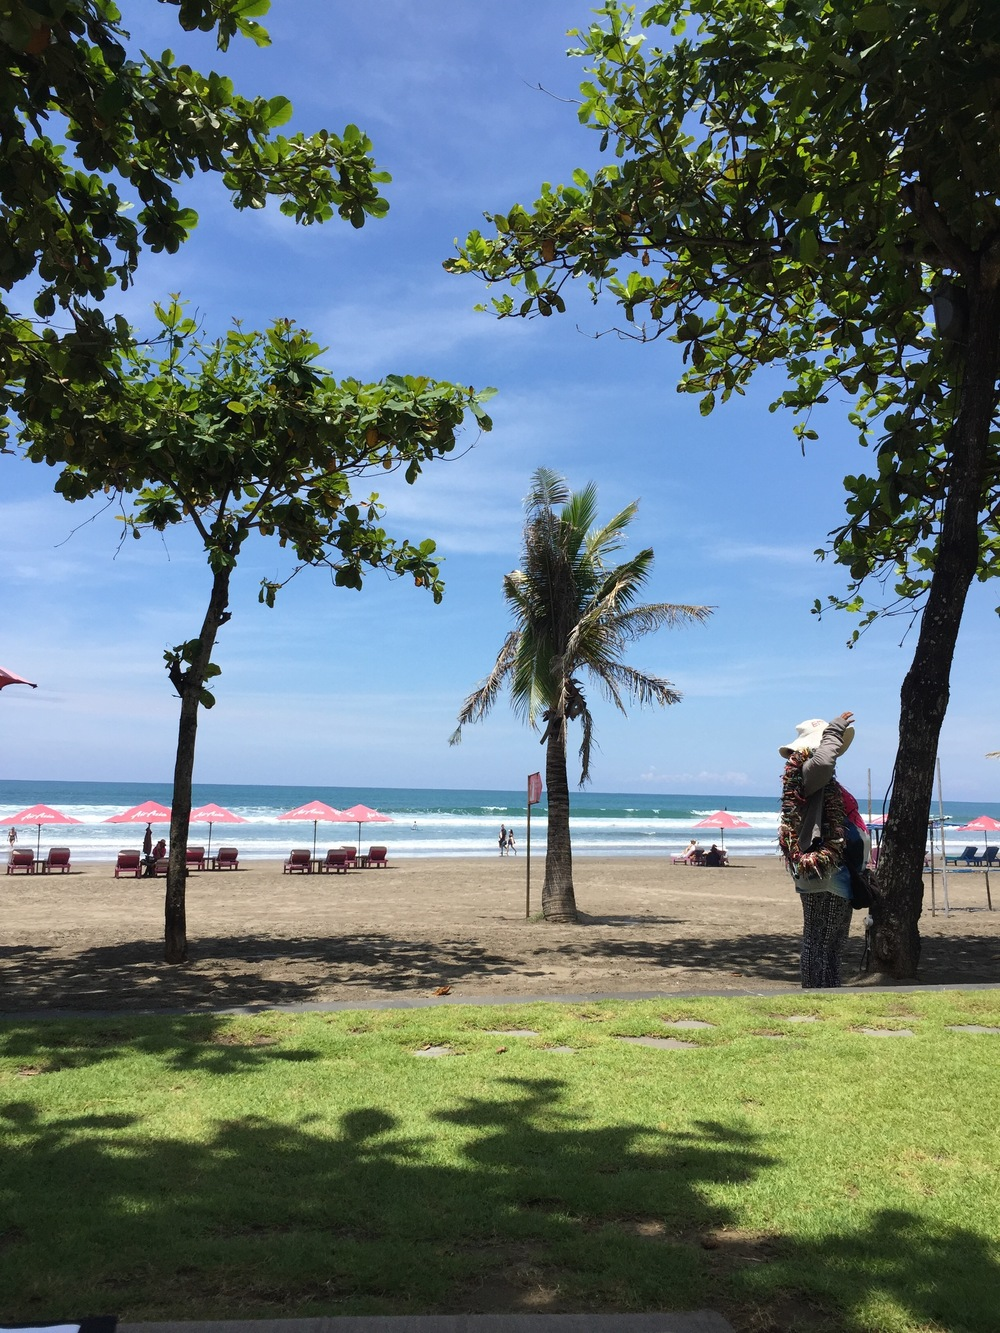 anantara-seminyak-bali-hotel-beach